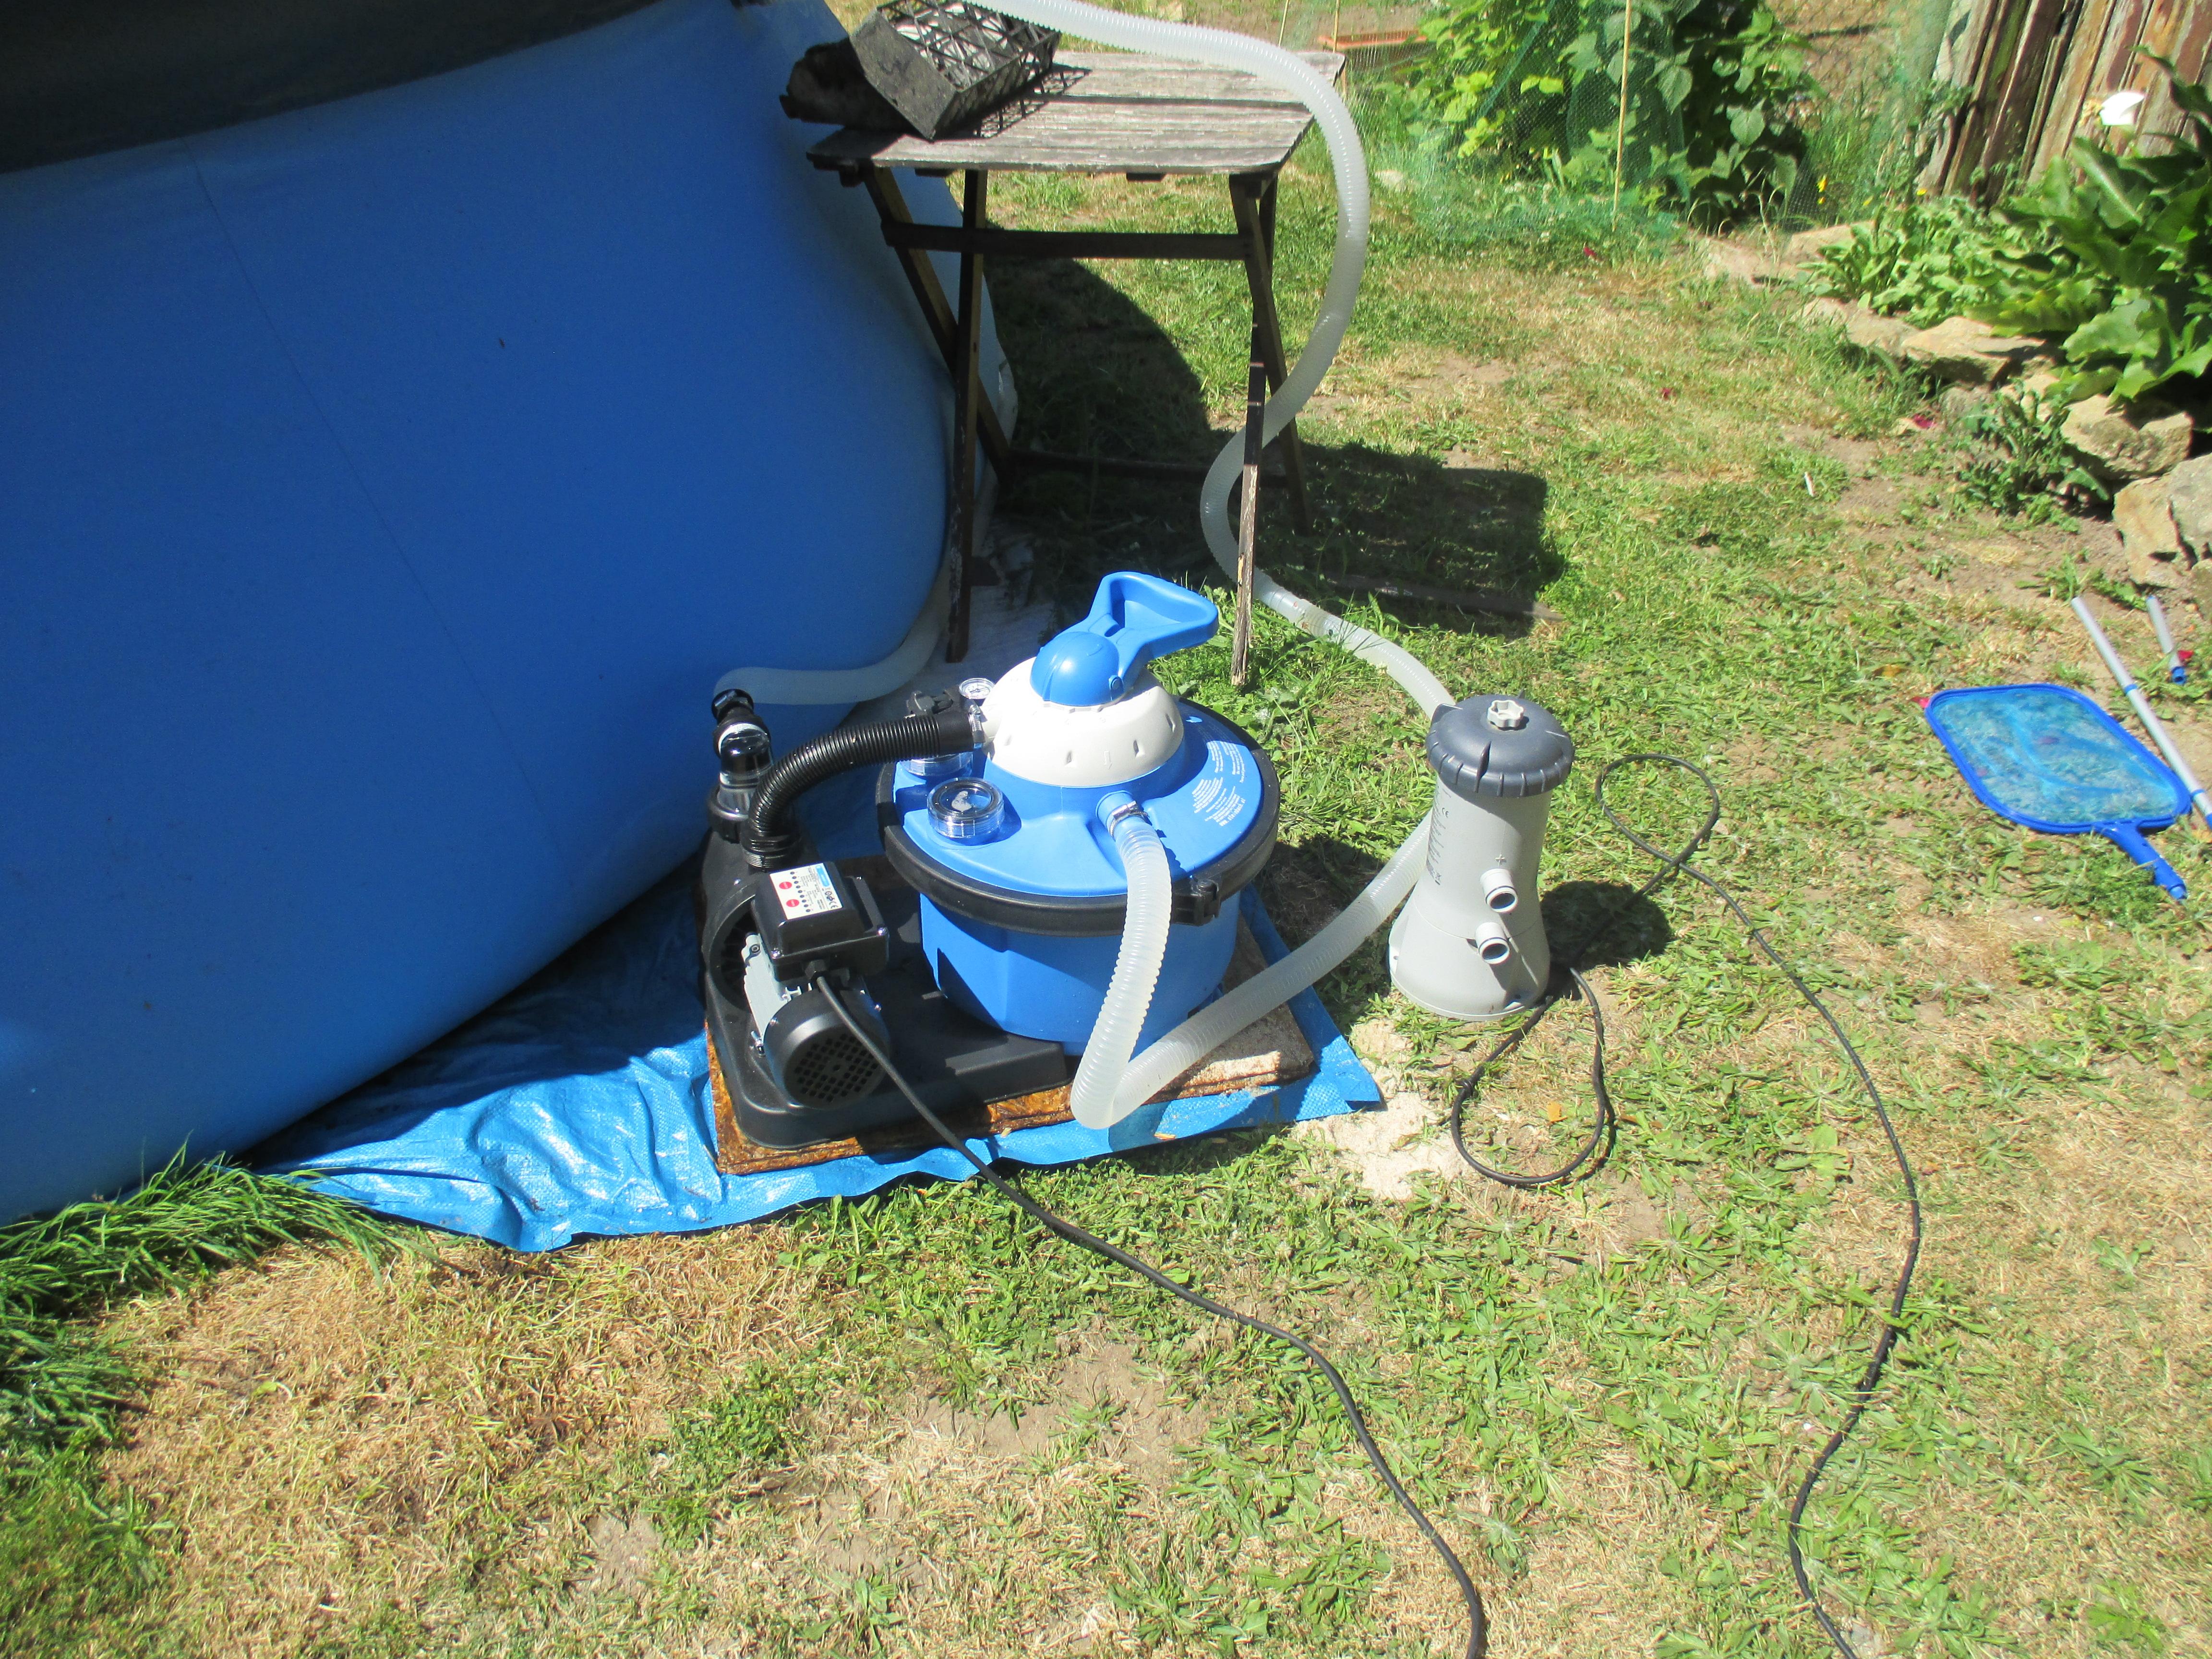 Pompe filtrante pour piscine speed clean 40200 comfort 50 for Minuterie pompe piscine